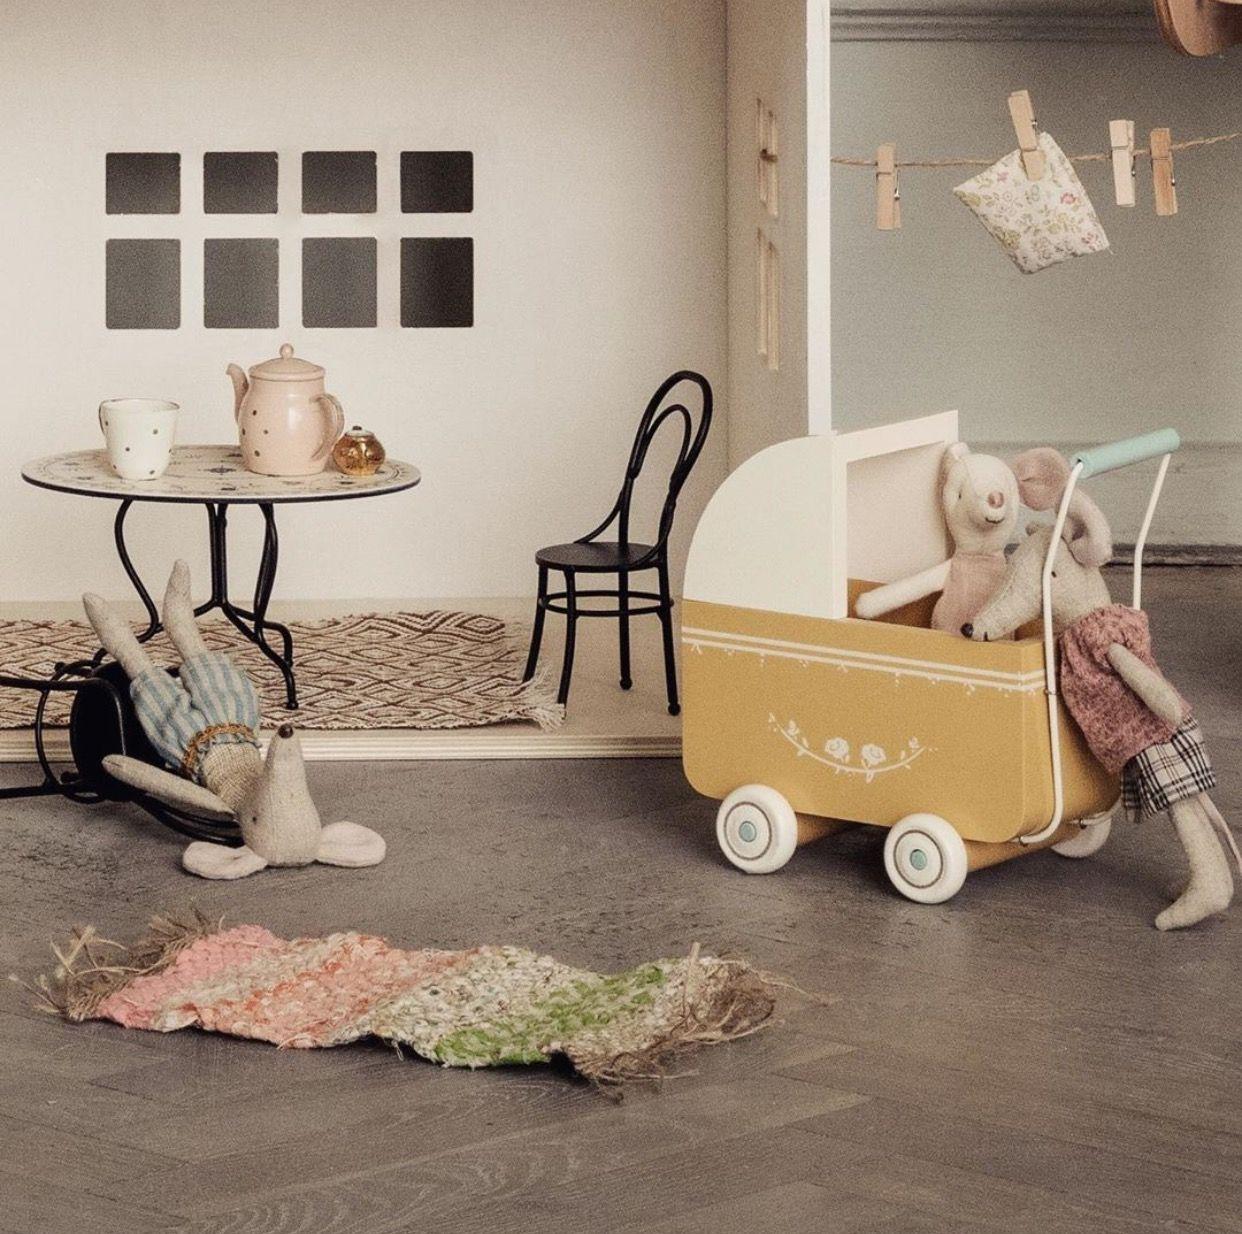 Maileg Toy Pram Maileg, Pram toys, Soft furnishings